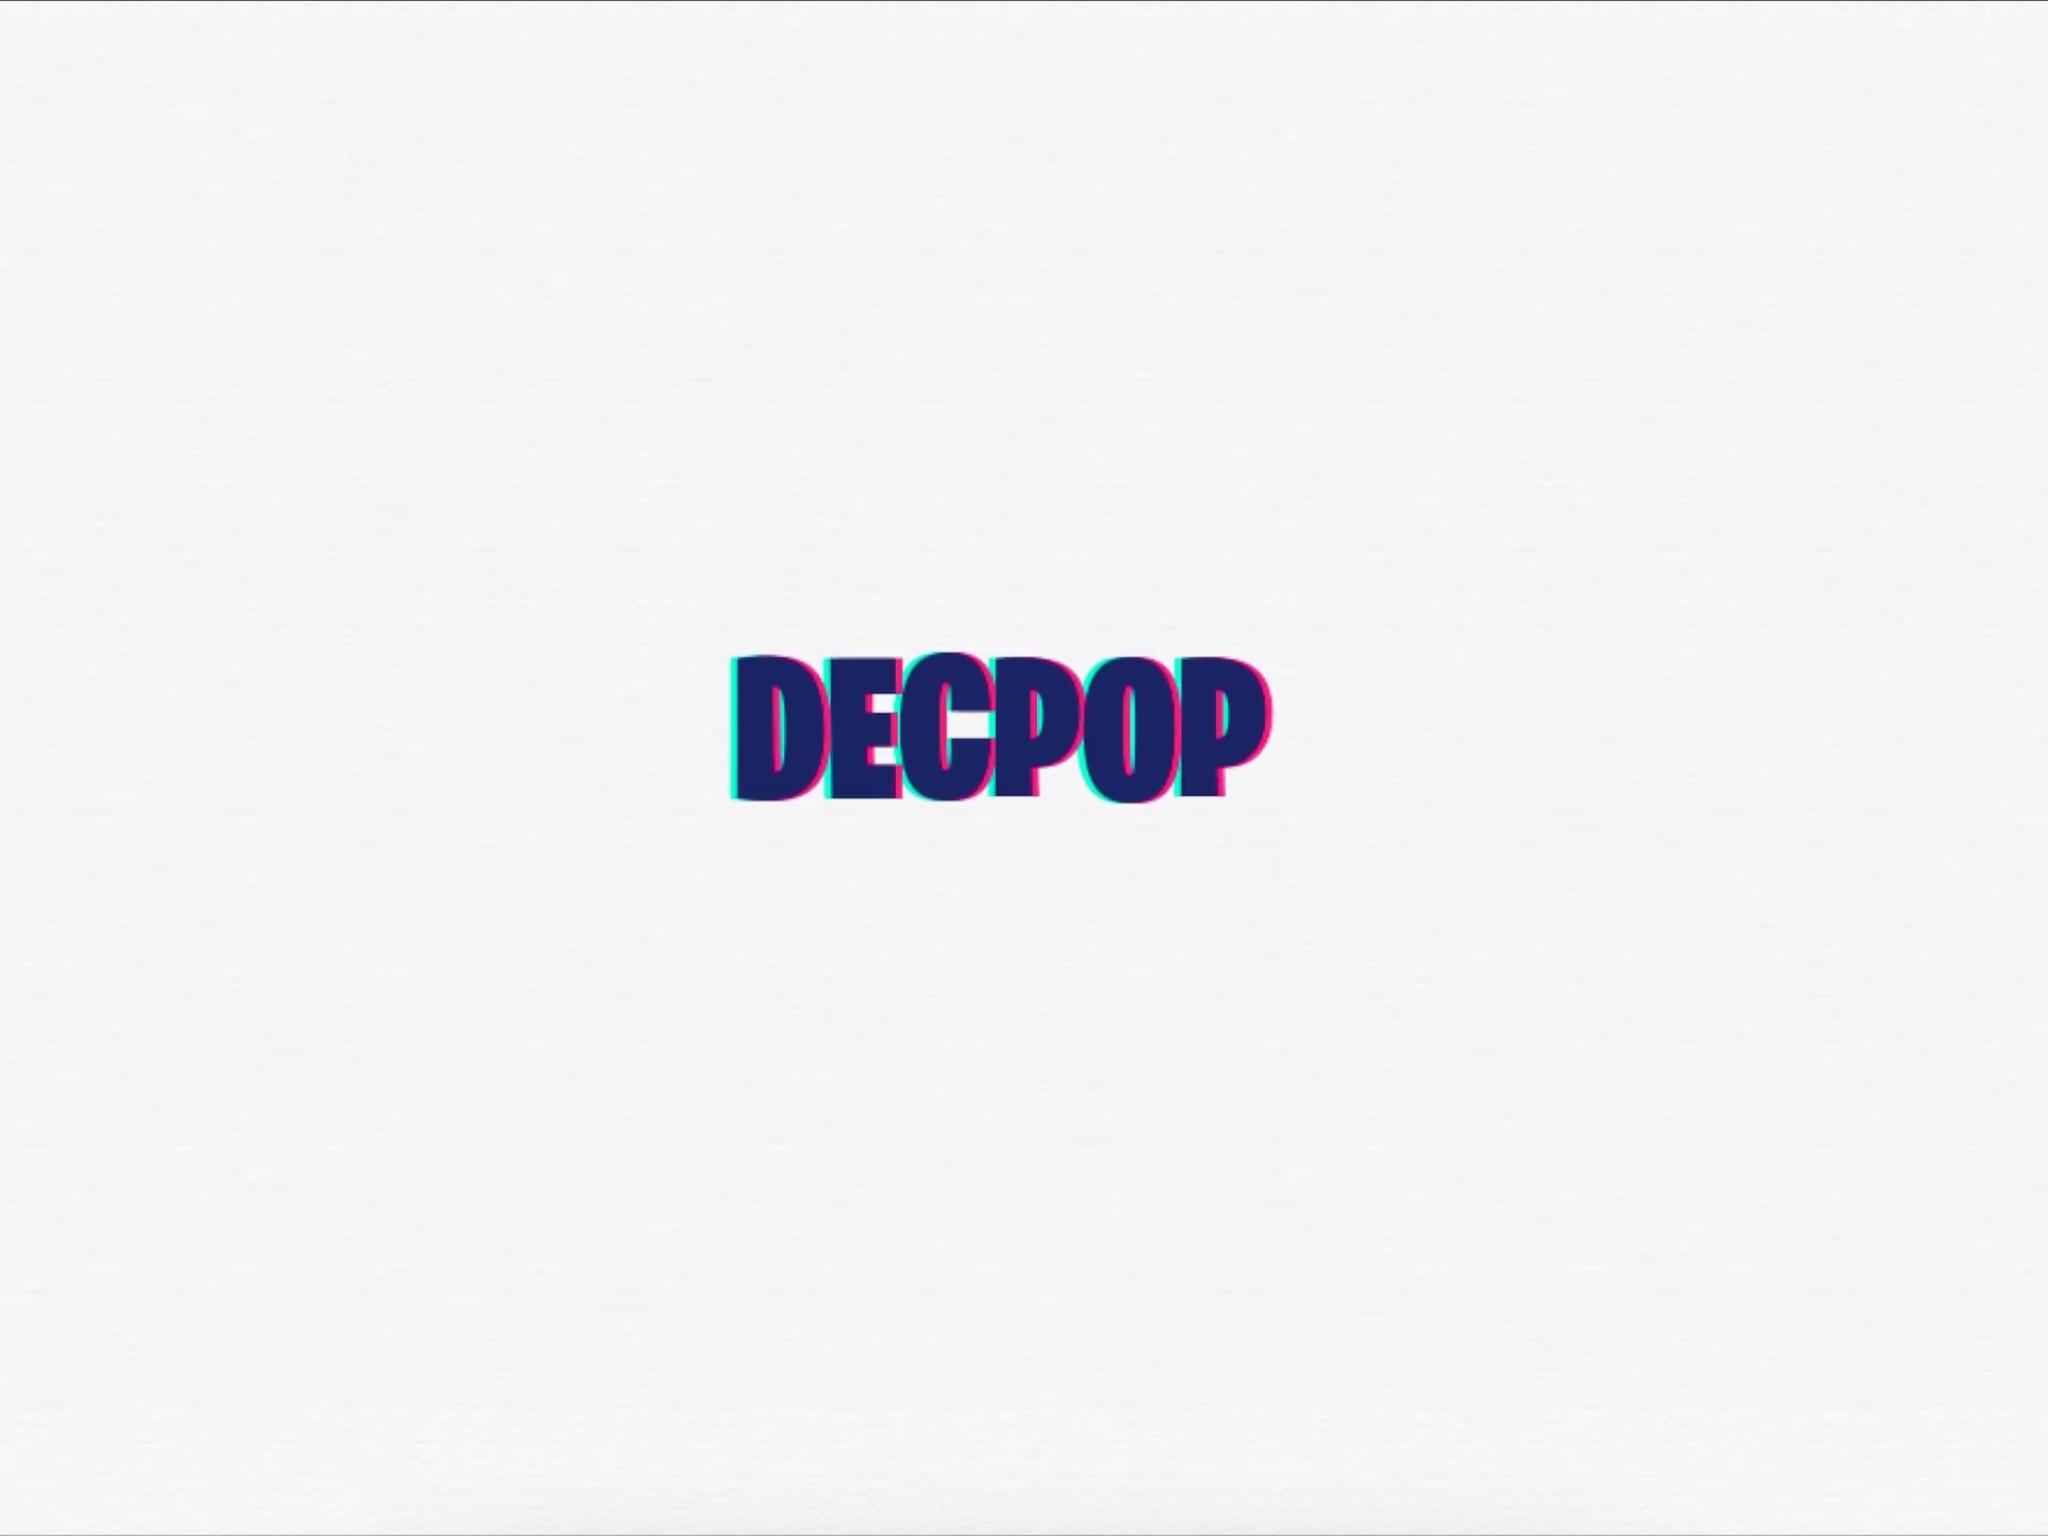 DP season 1